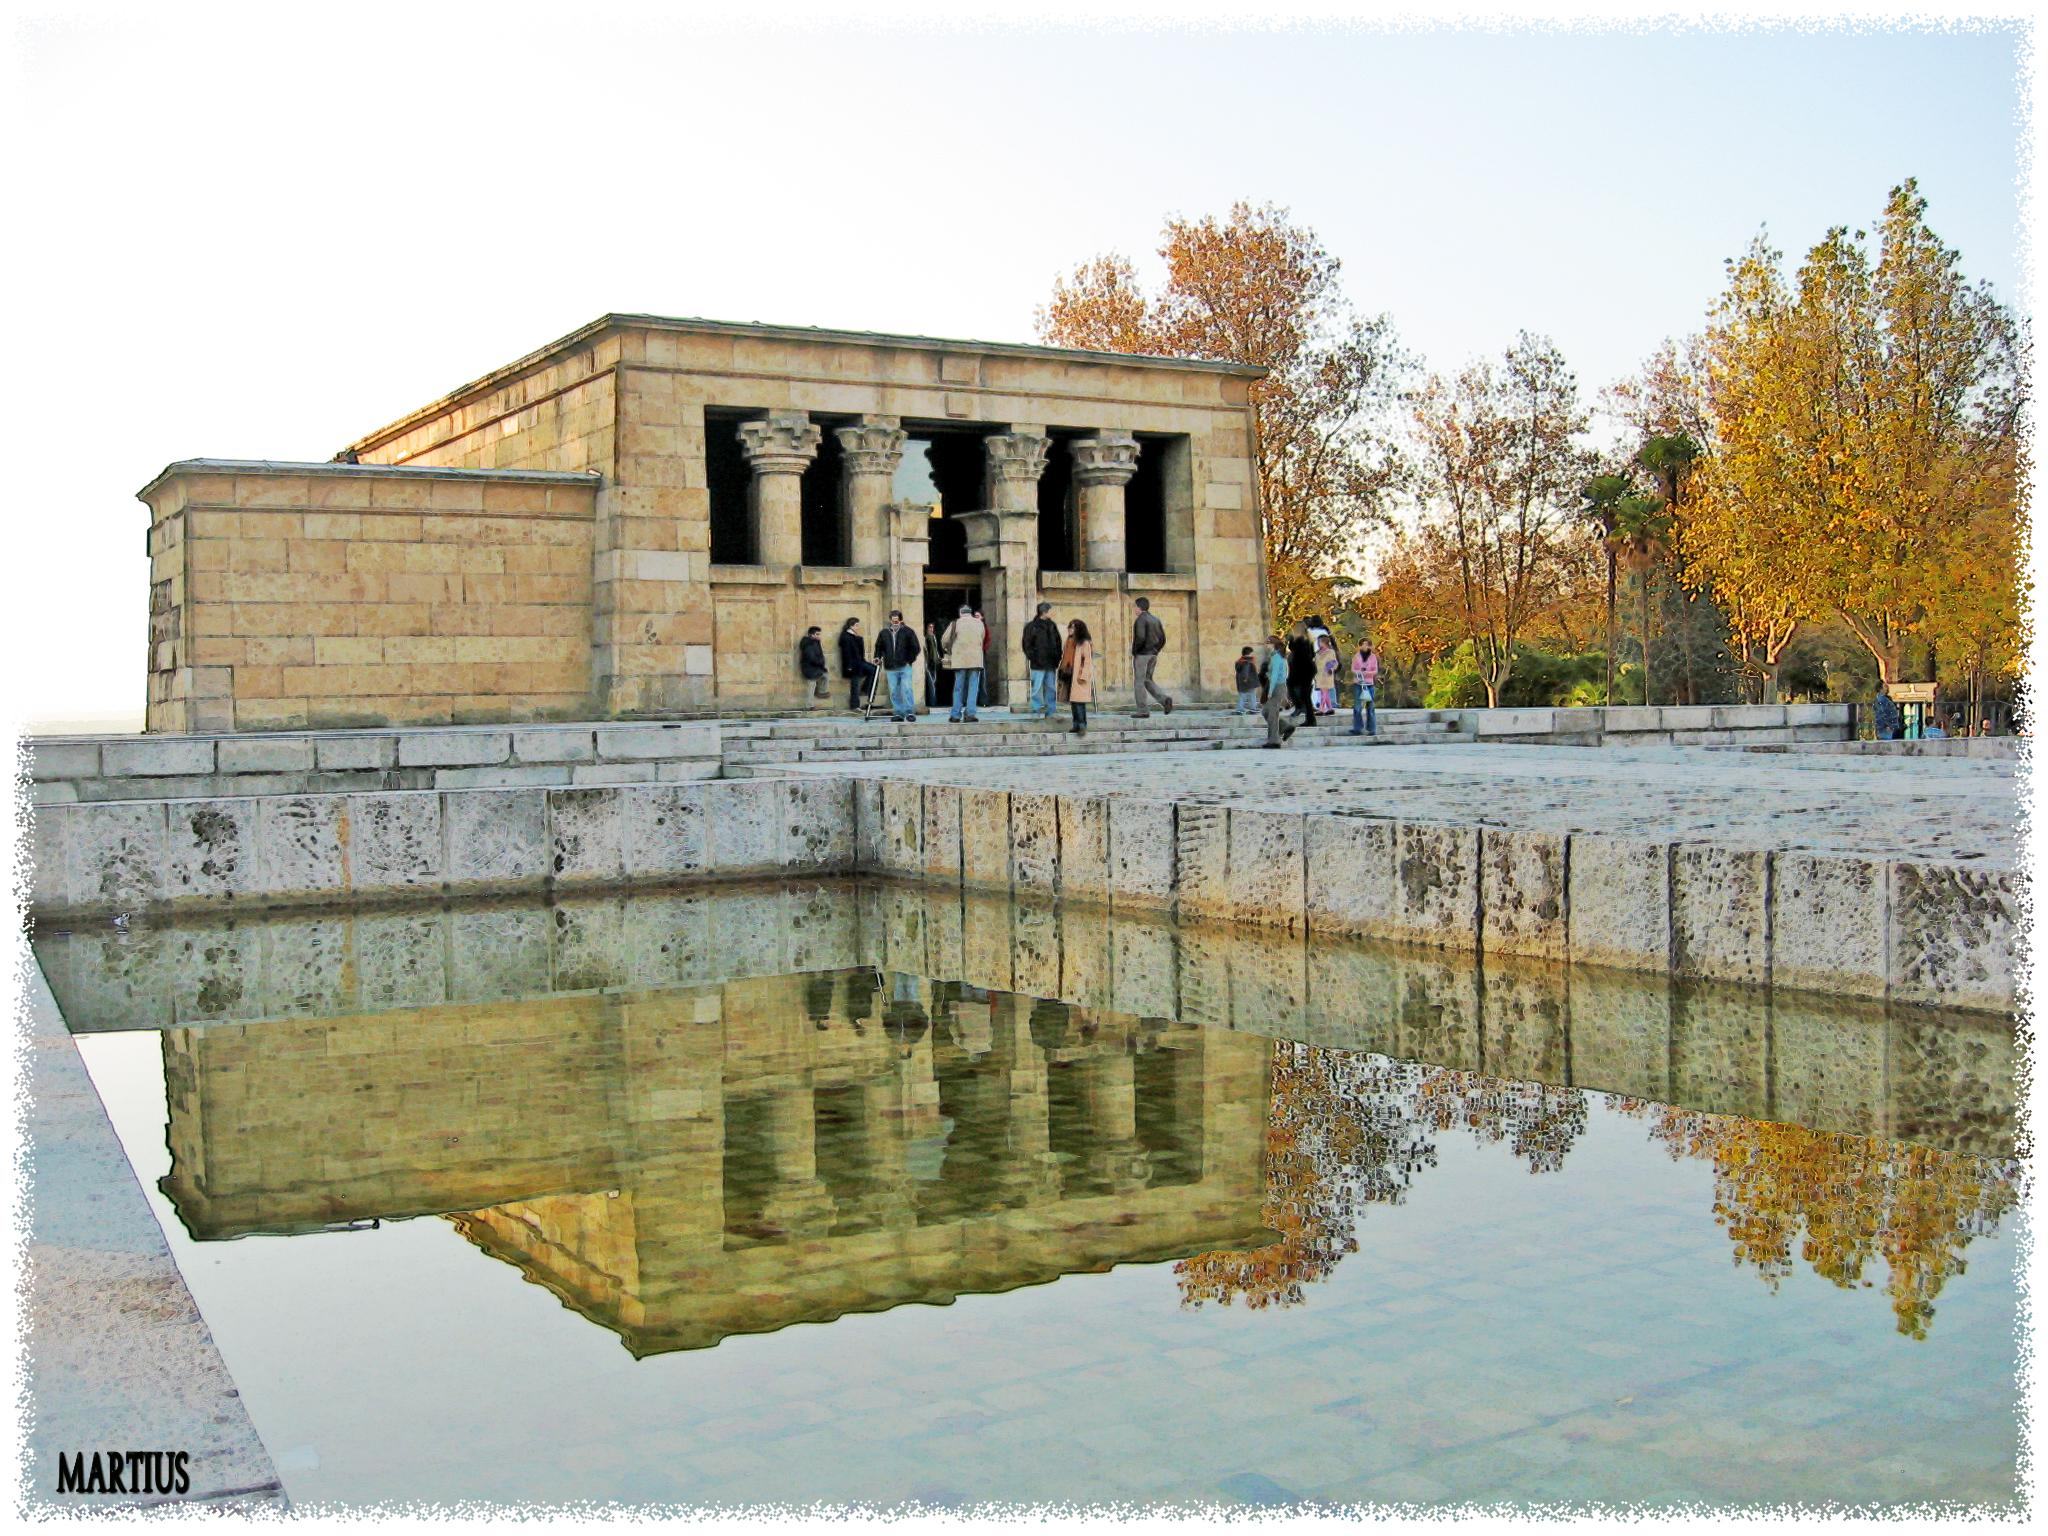 File:Templo de Debod (Madrid) 04.jpg